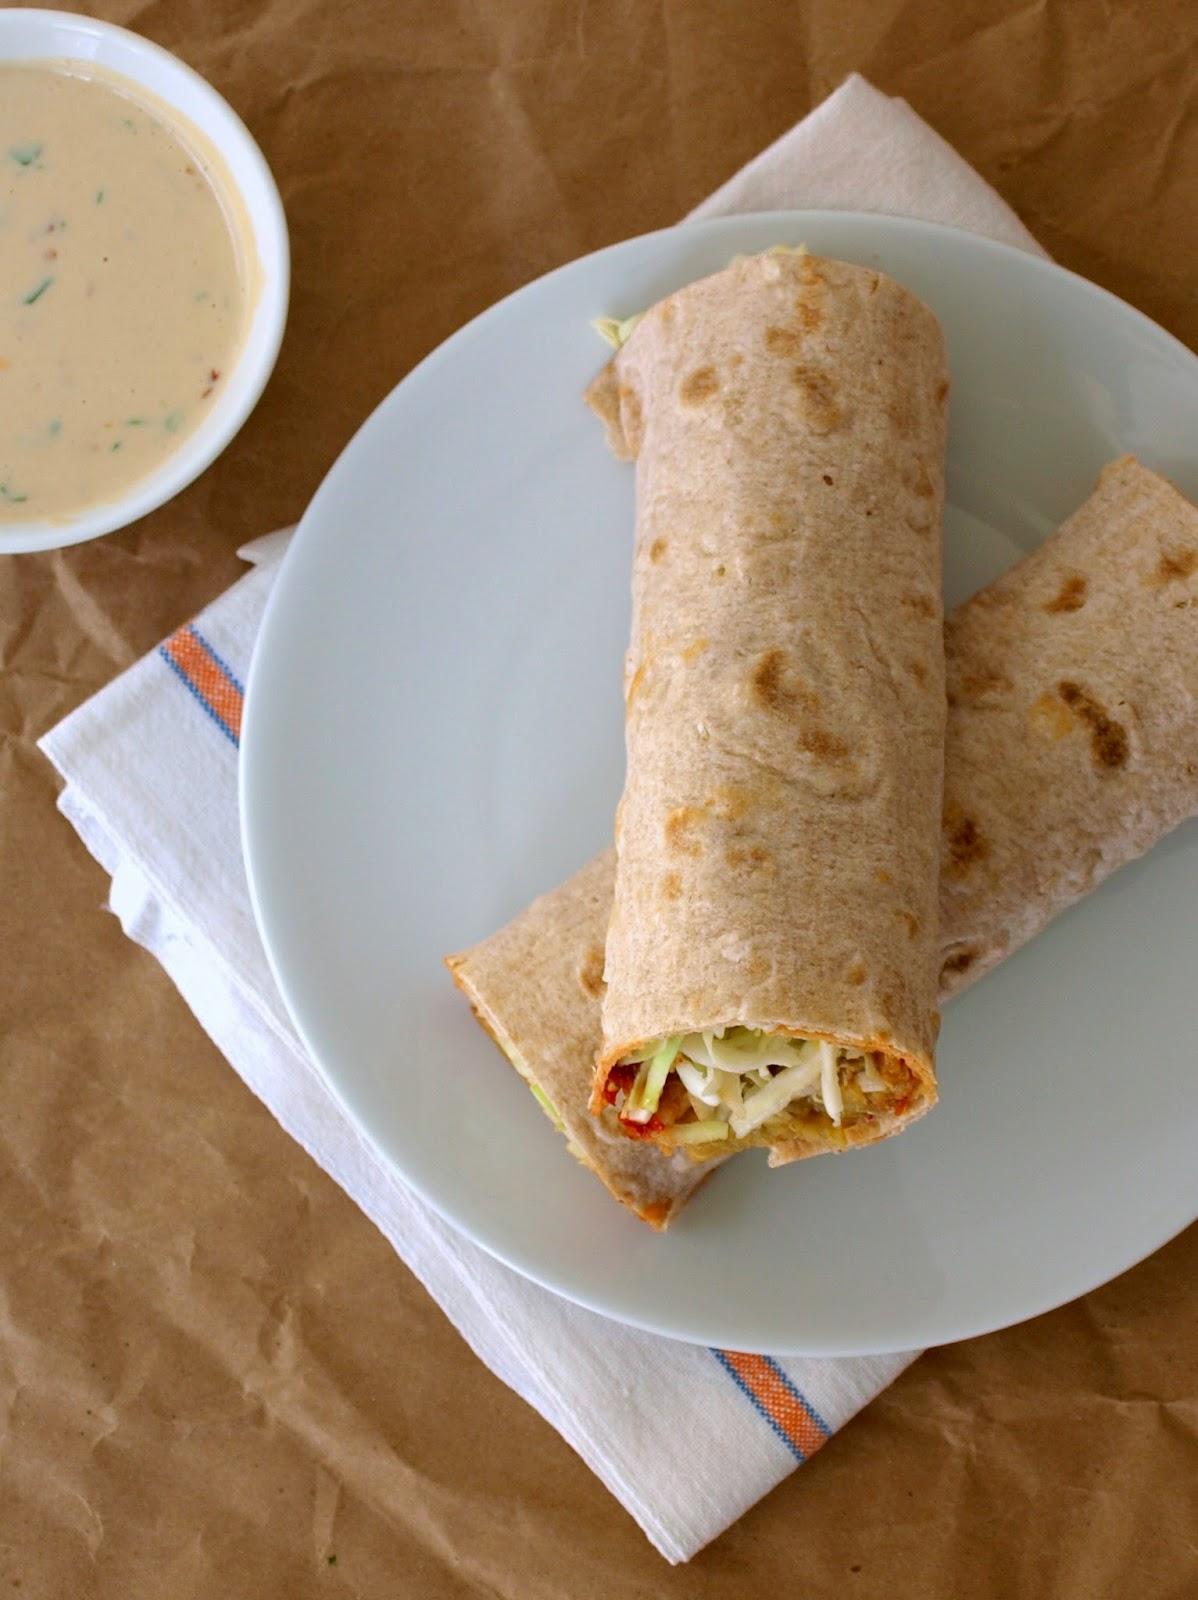 Spicy+Lentil+&+Quinoa+WrapsTacos+with+Tahini+Sauce+(1).JPG